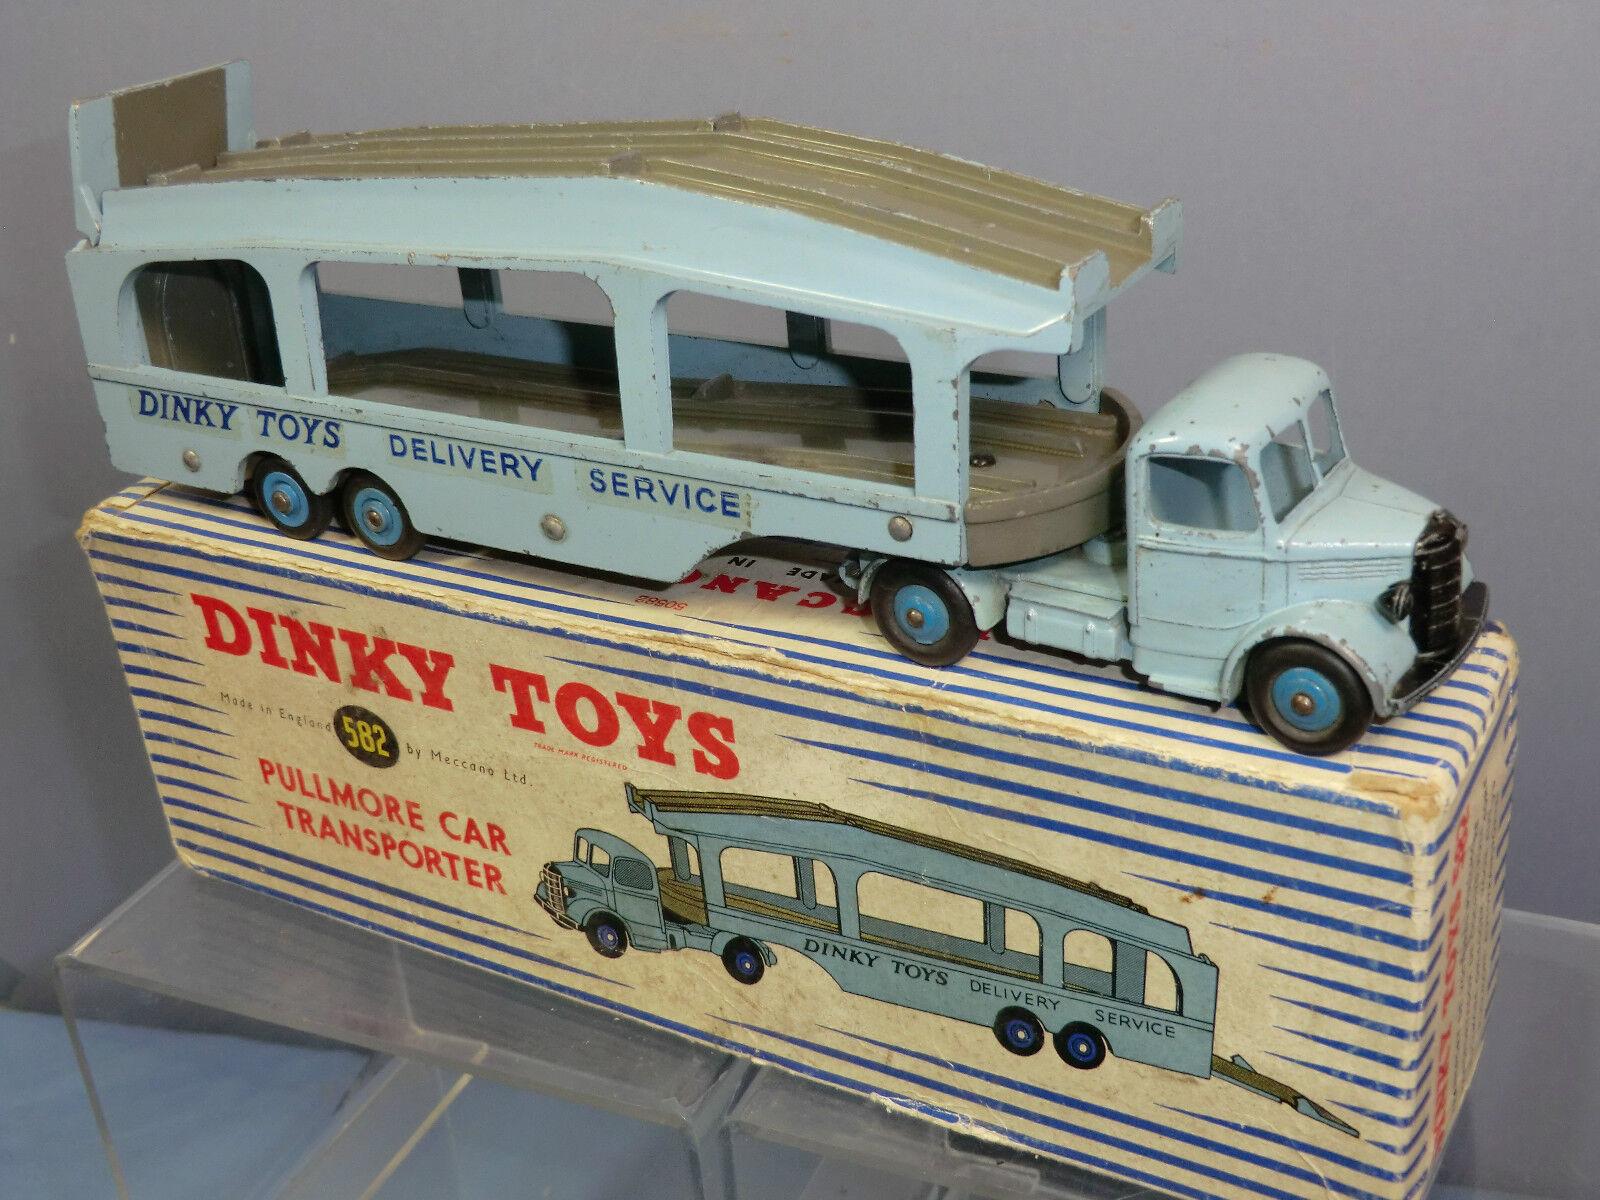 DINKY TOYS MODEL No.582 PULLMORE CAR TRANSPORTER  6 RIVET TRAILER  VN MIB RARE